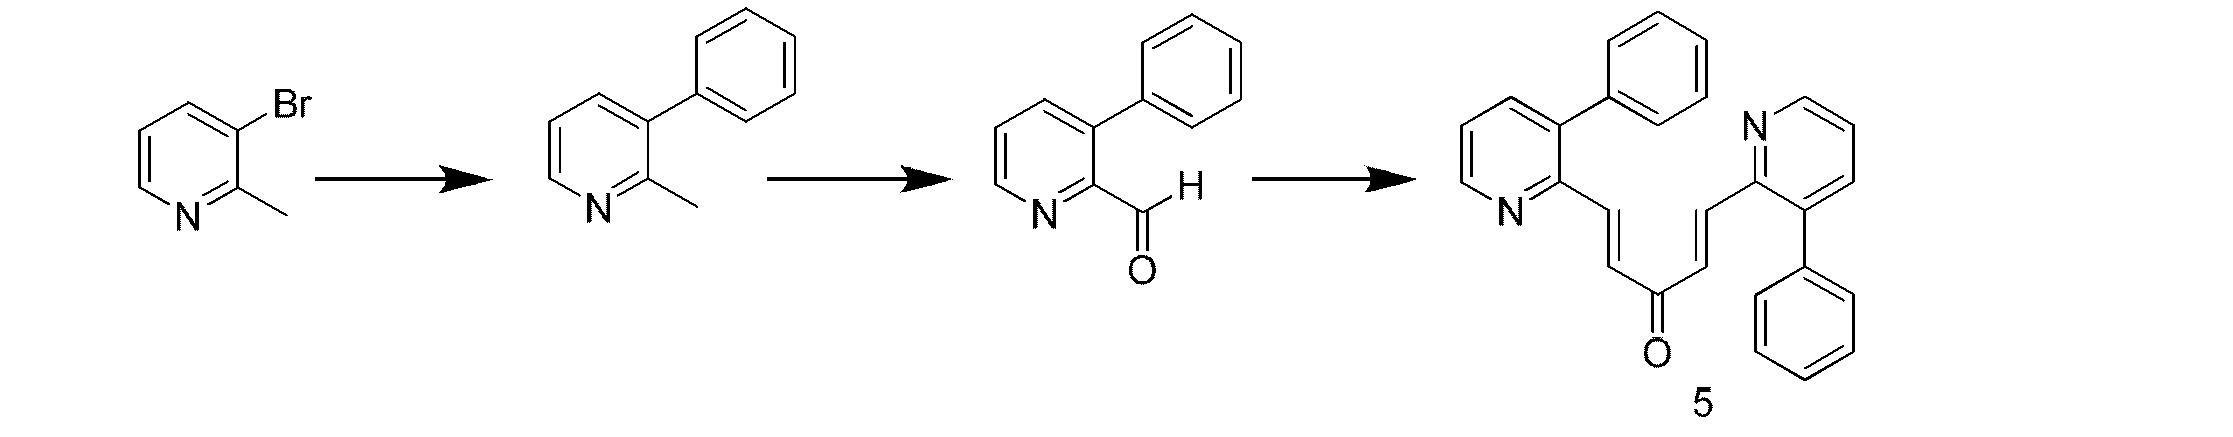 Figure CN103086958AD00142